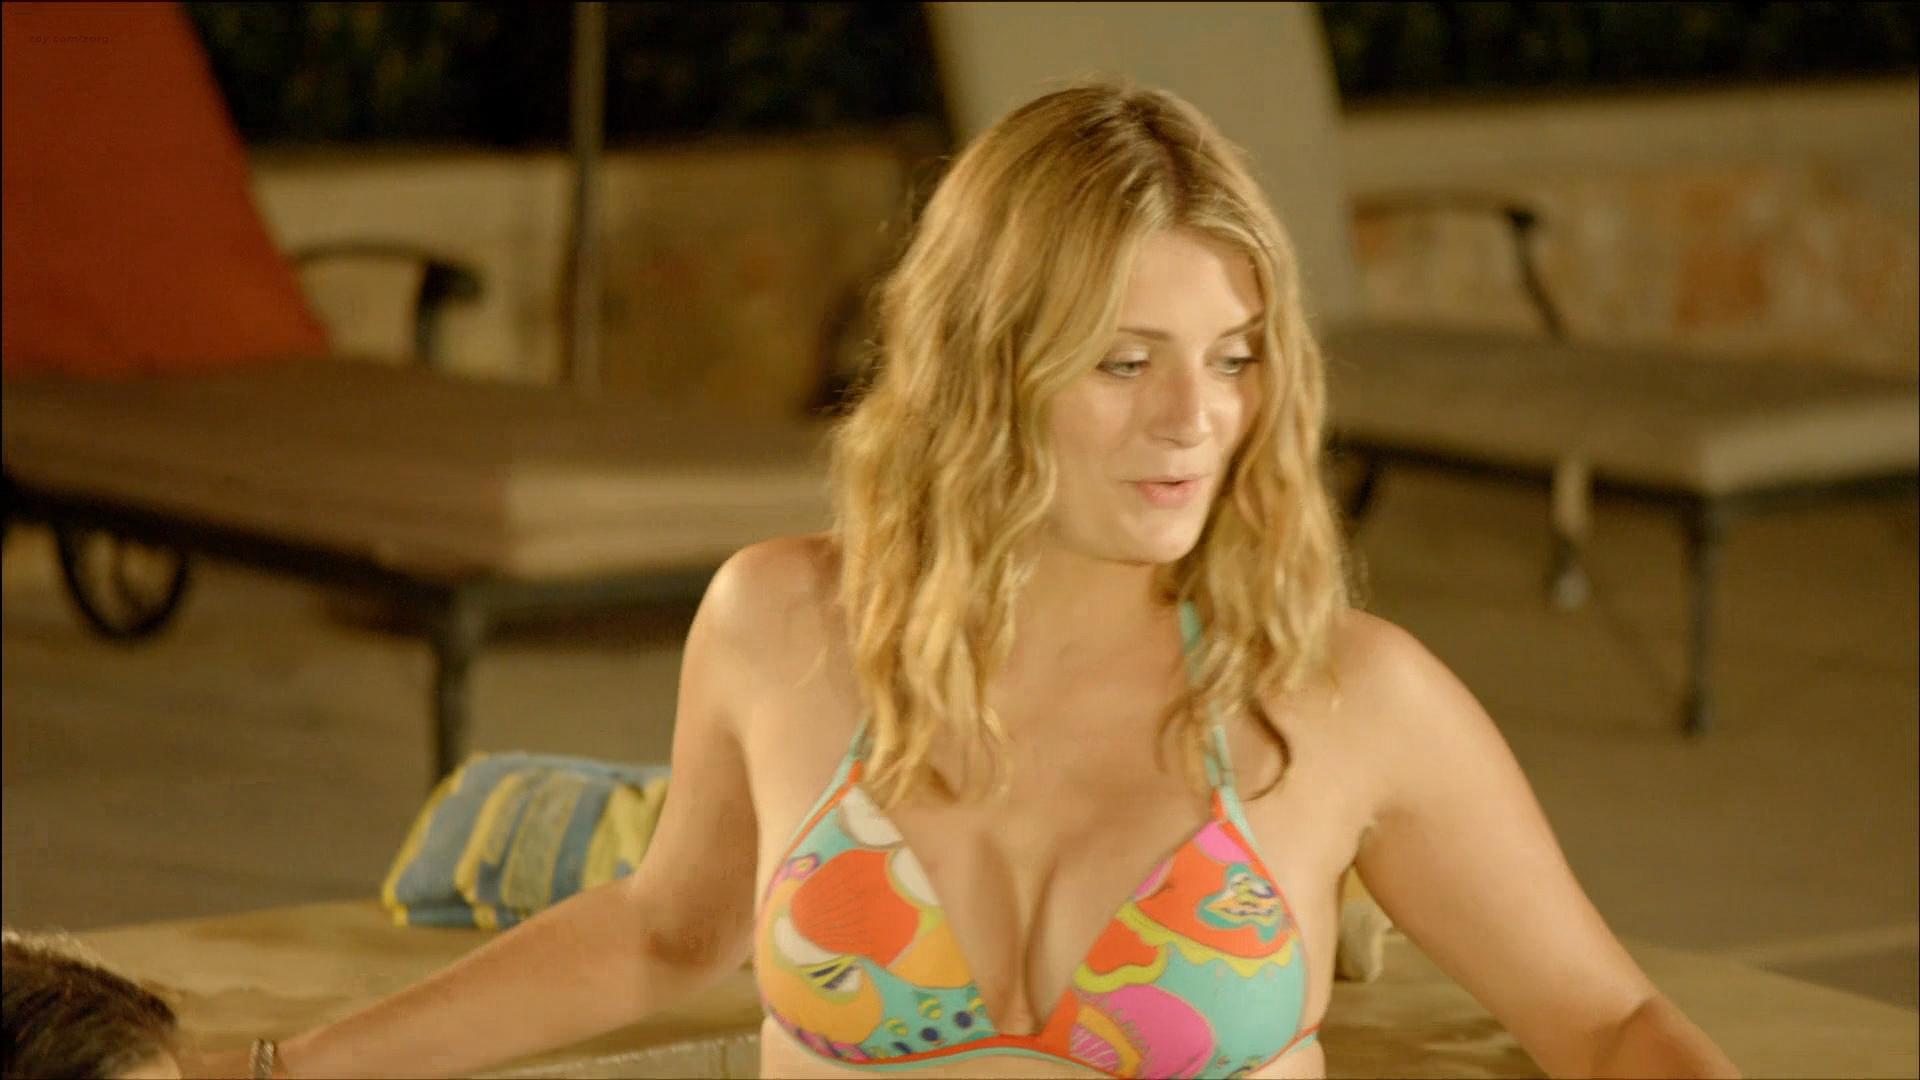 Jena Sims nude sex Mischa Barton hot others nude - American Beach House (2015) hd1080p BluRay (1)